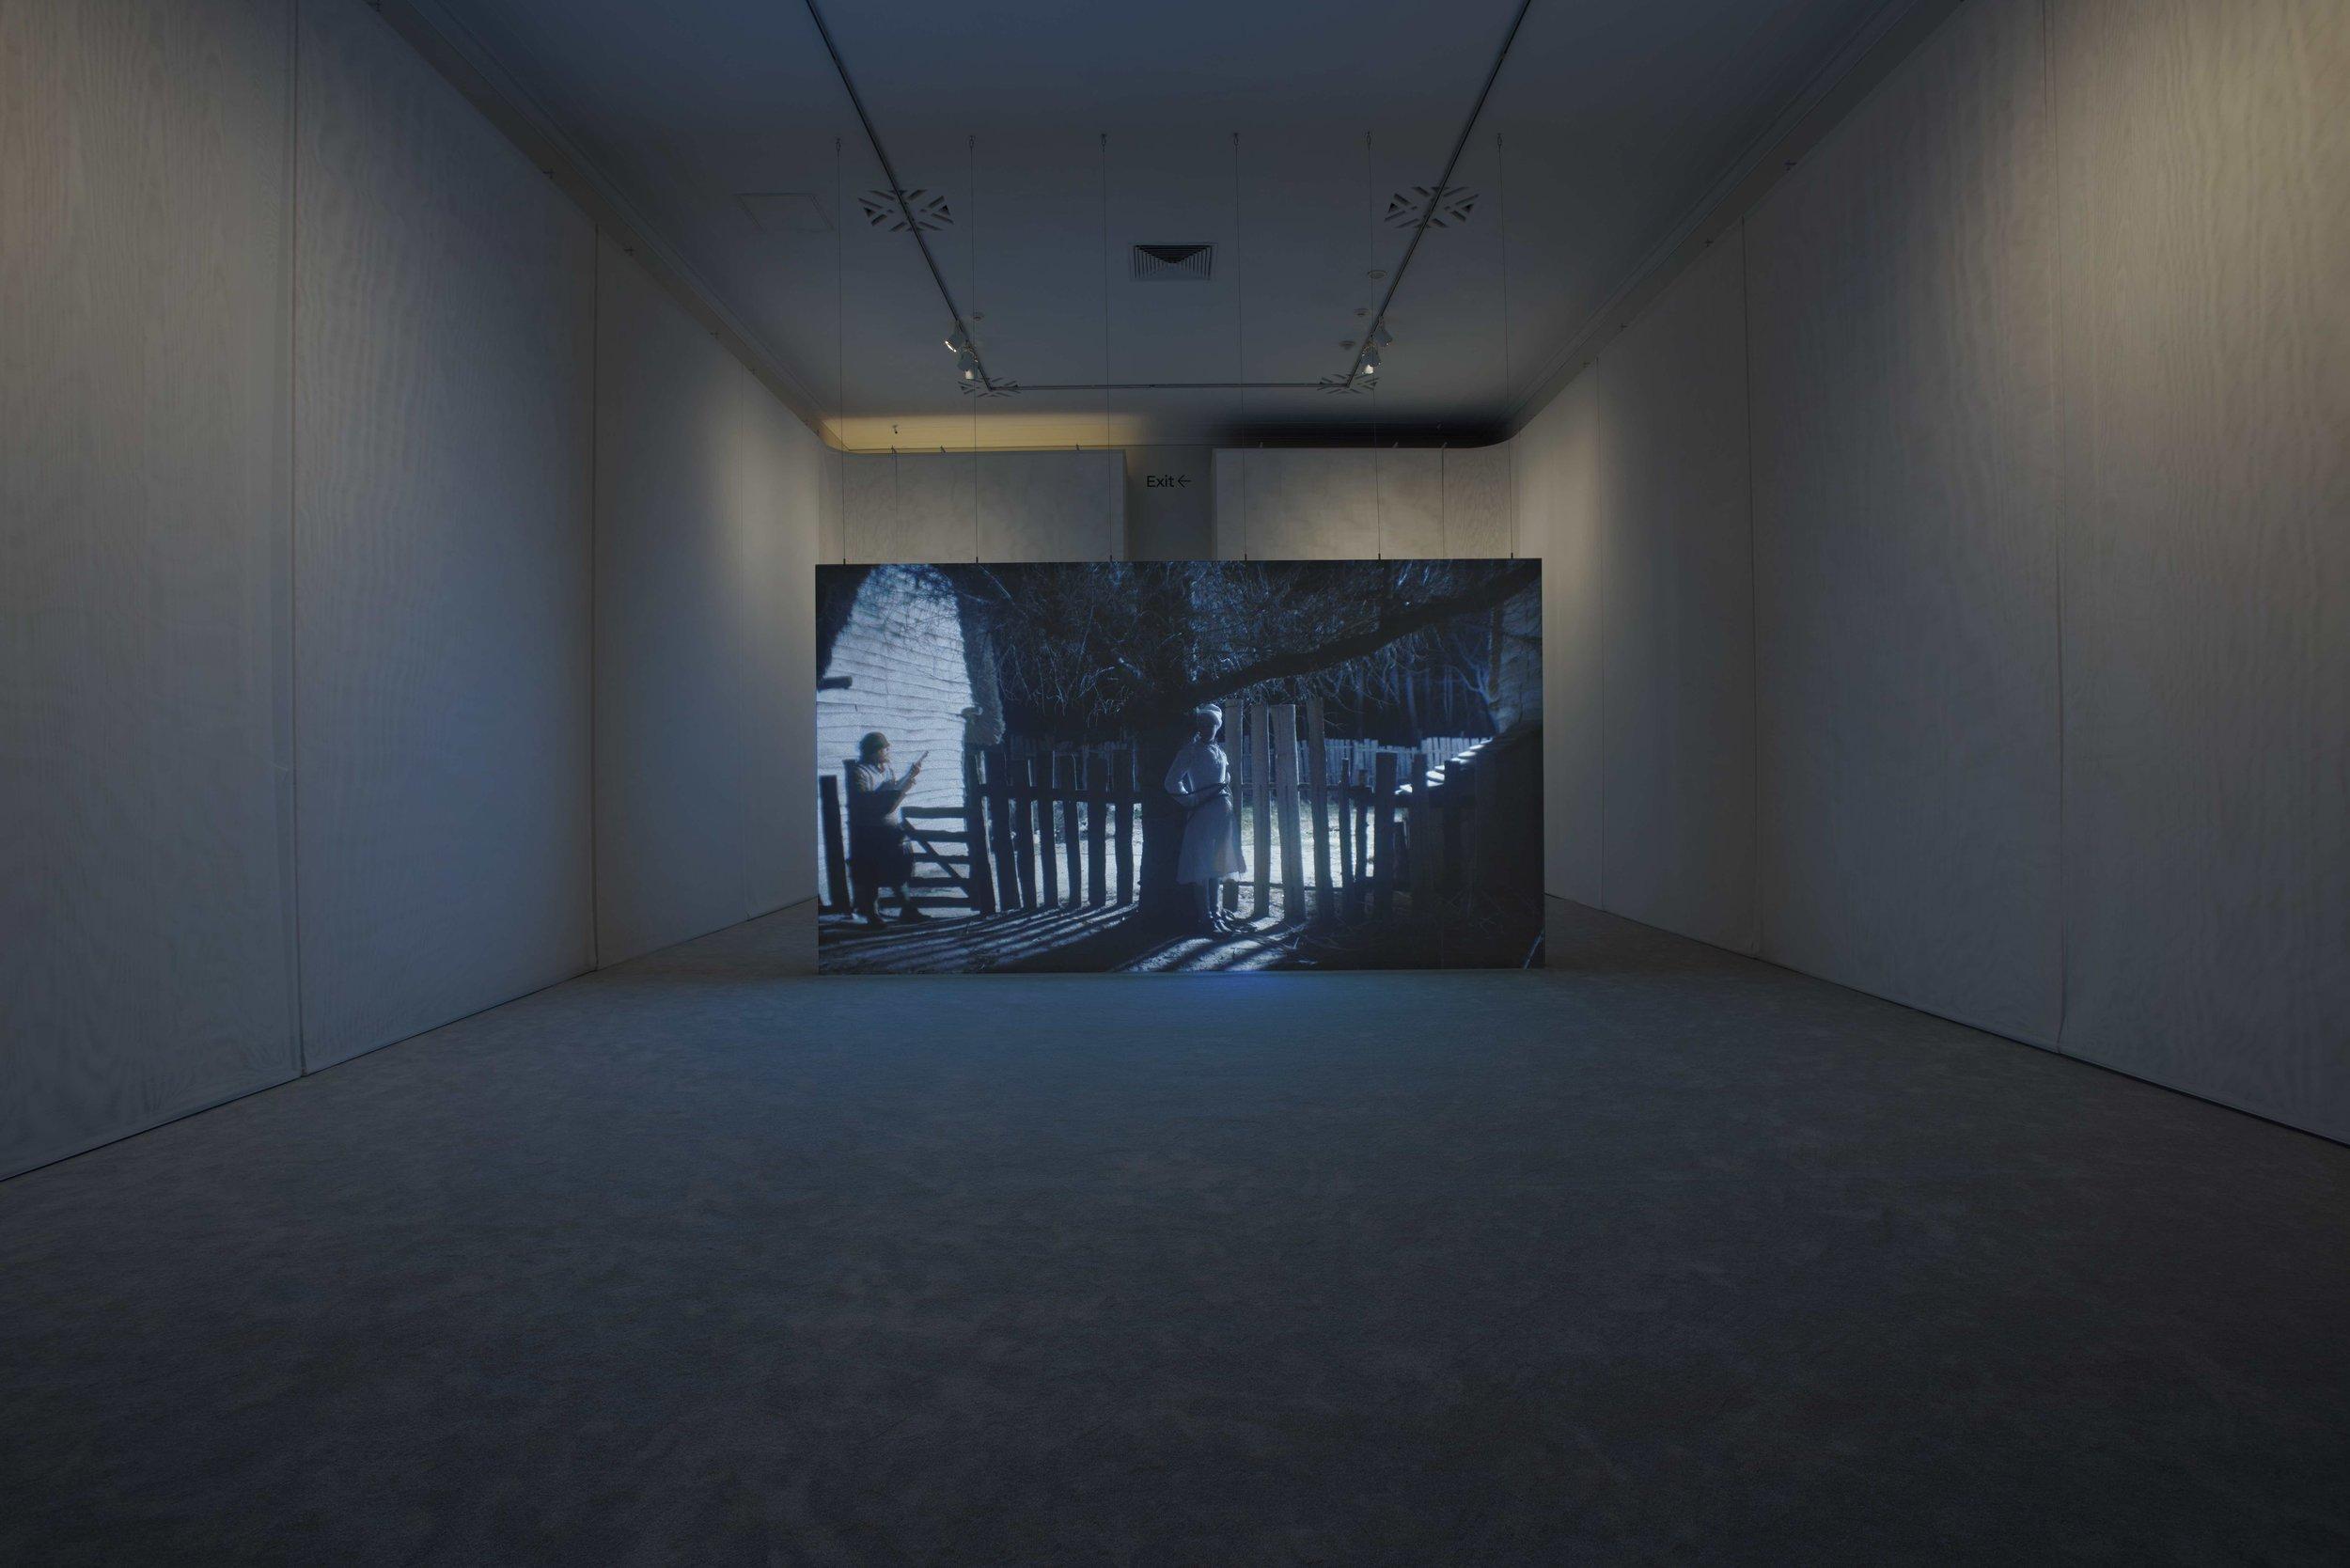 Wil-O-Wisp, Rachel Rose, 2018. Installation view: Rachel Rose, Philadelphia Museum of Art, 2 May - 16 September 2018. Courtesy of the Artist, Pilar Corrias Gallery, and Gavin Brown's Enterprise.